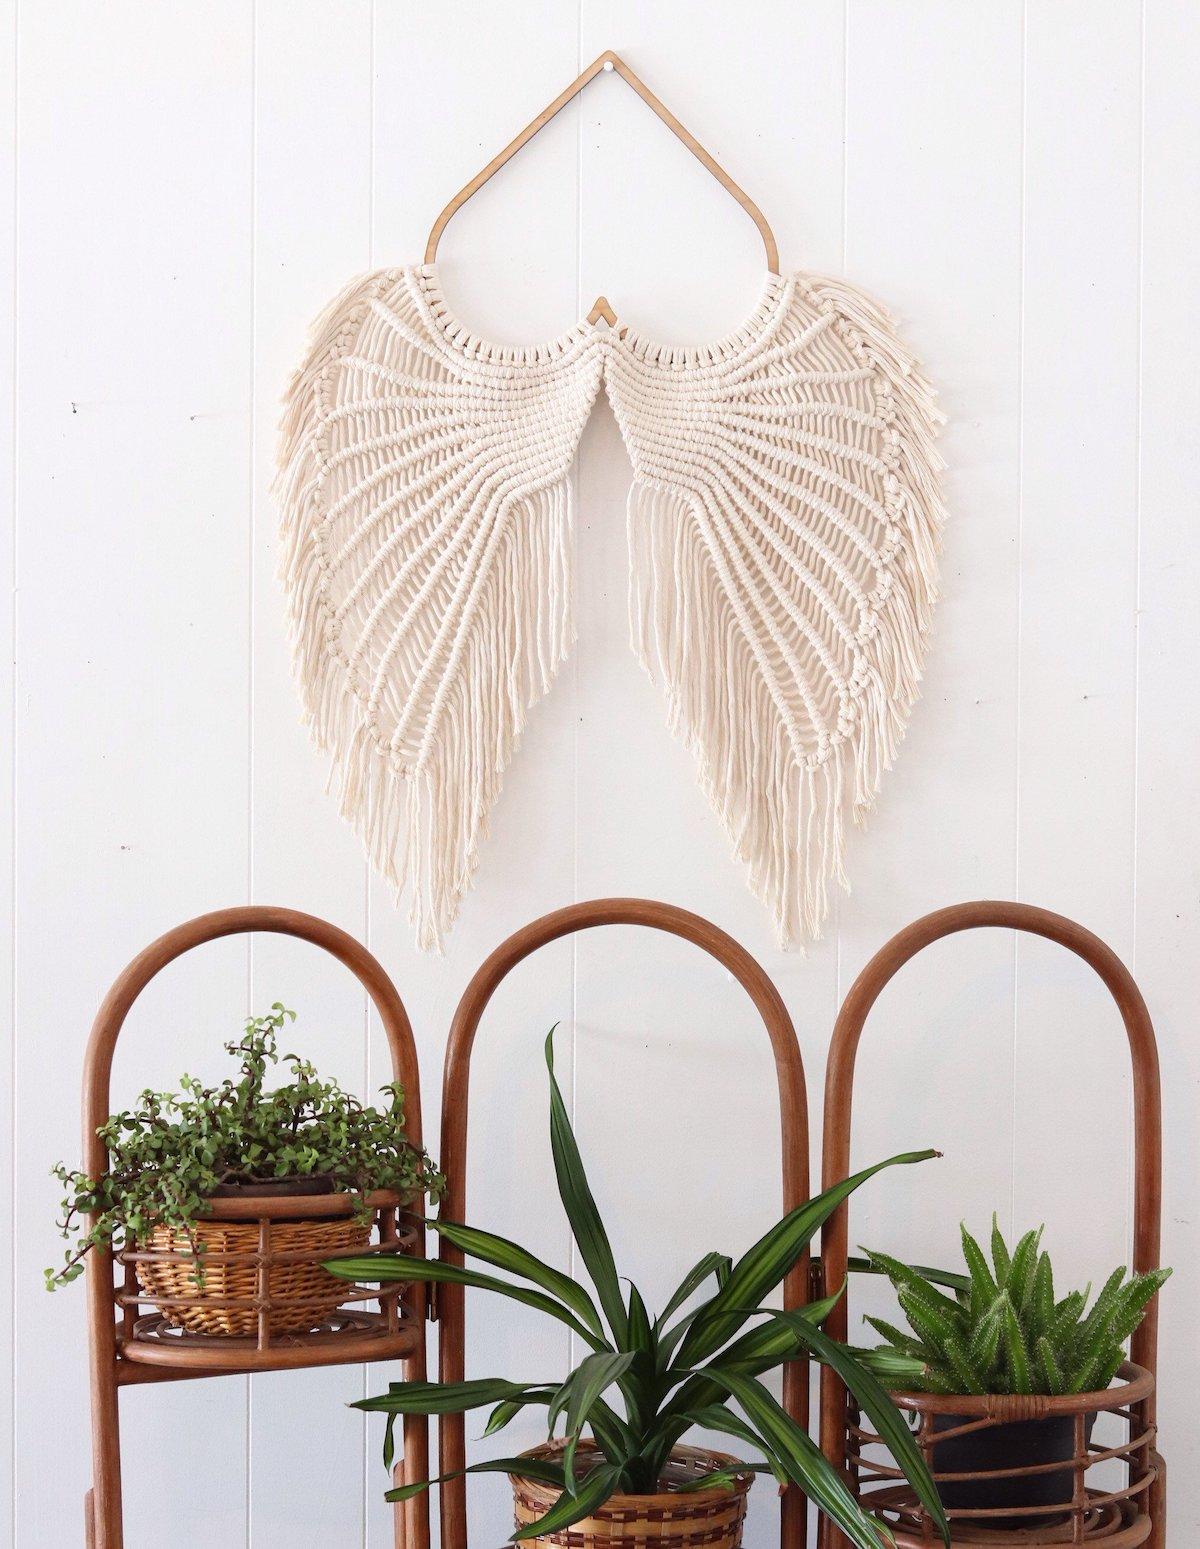 Angel Wings Macrame - Macrame Wallhanging